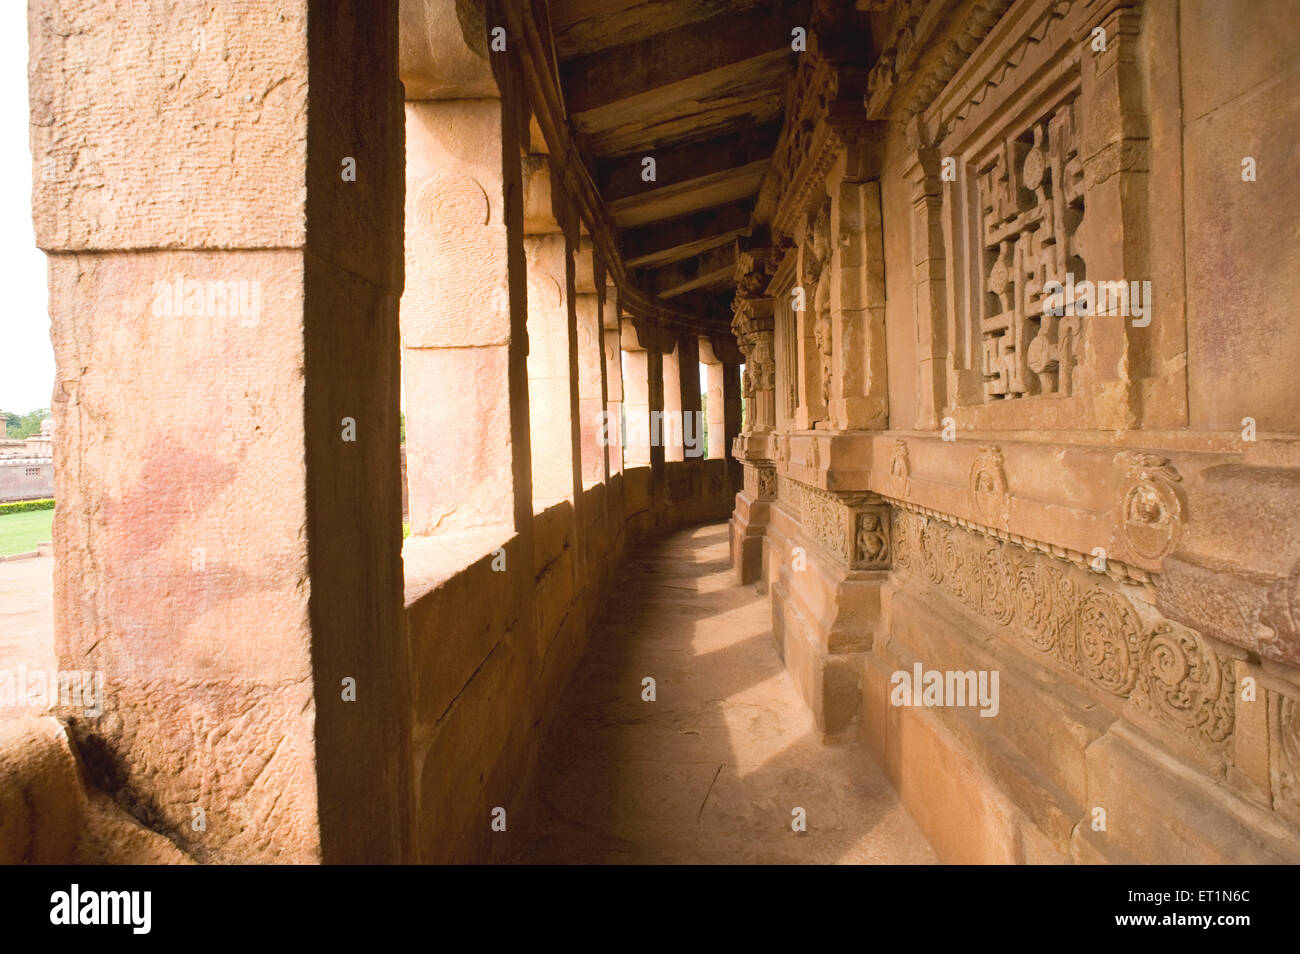 Corridor of durga temple ; Aihole ; Bagalkot ; Karnataka ; India - Stock Image